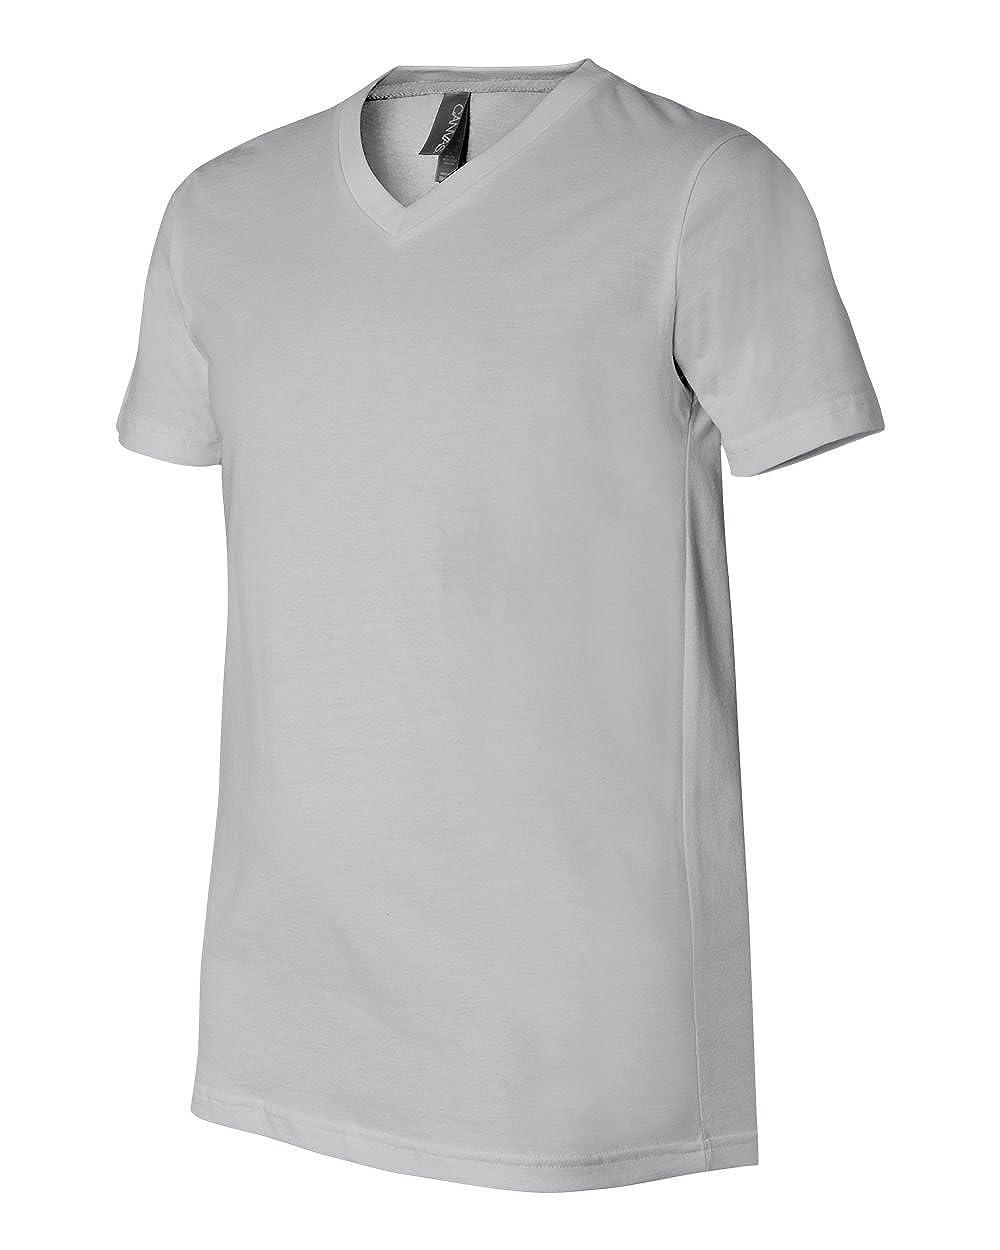 Canvas C3005 Unisex Short Sleeve Tee Bella